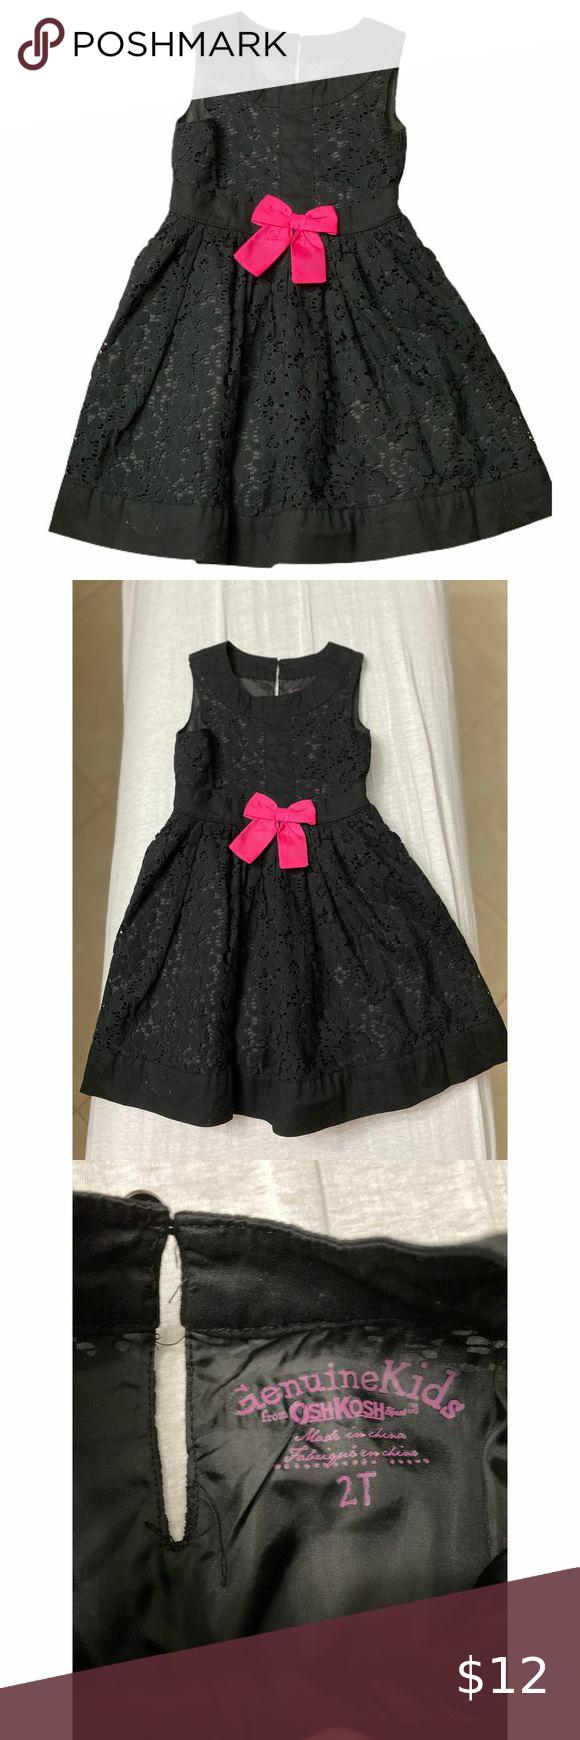 Oshkosh Girls 2t Black Special Occasion Dress Special Occasion Dresses Occasion Dresses Kids Dresses [ 1740 x 580 Pixel ]